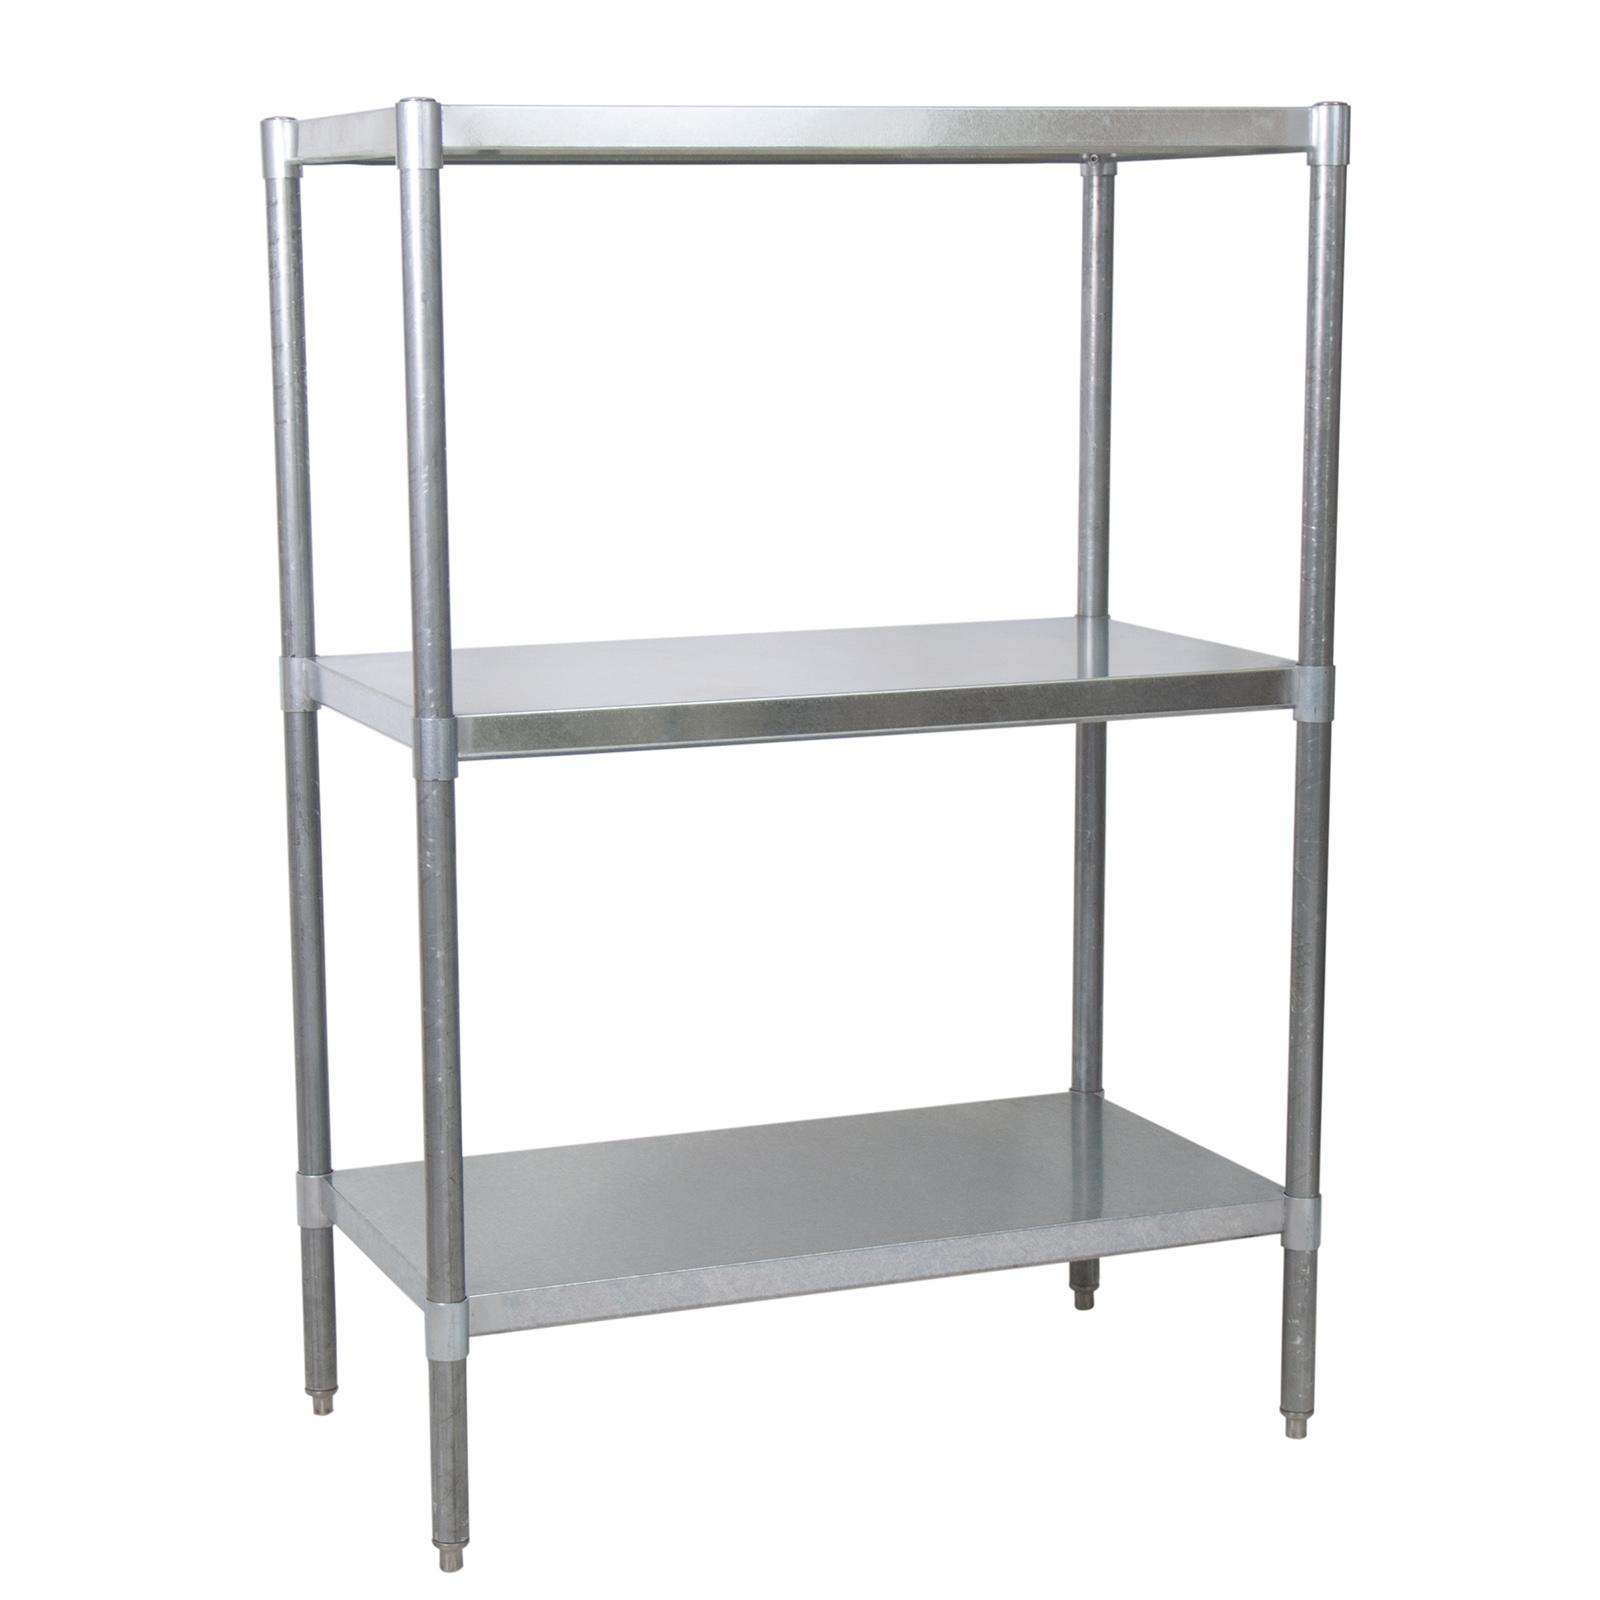 BK Resources VSU5-3124 shelving unit, solid flat